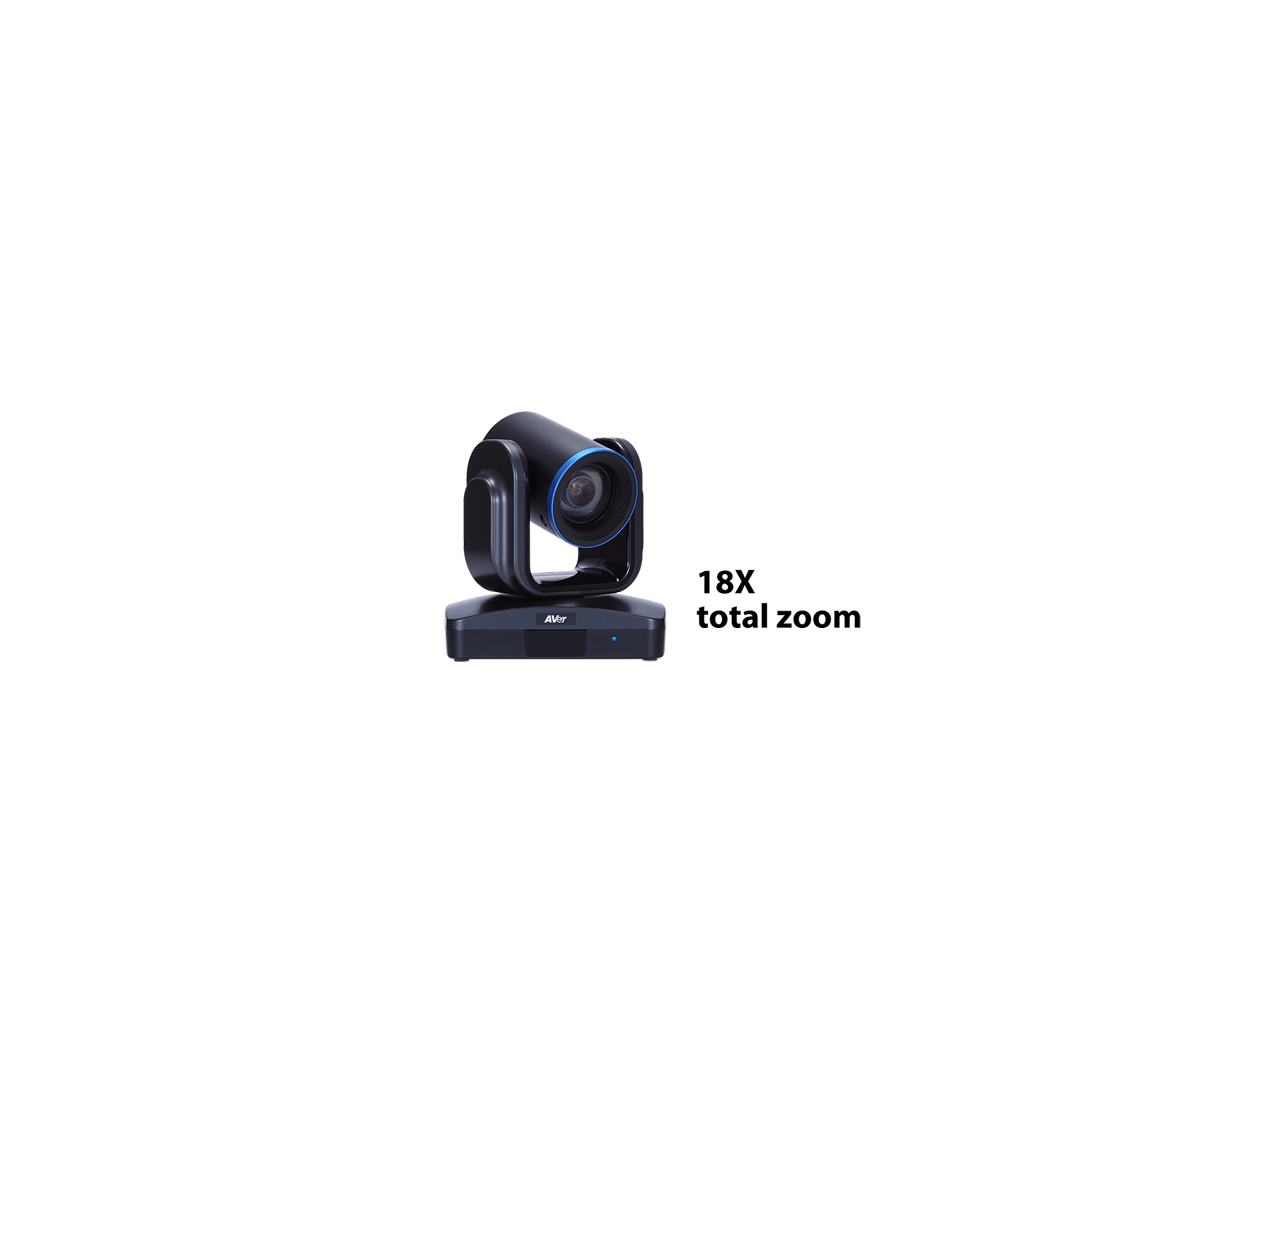 61V2A40000AR 3 Vizuáltechnika bolt